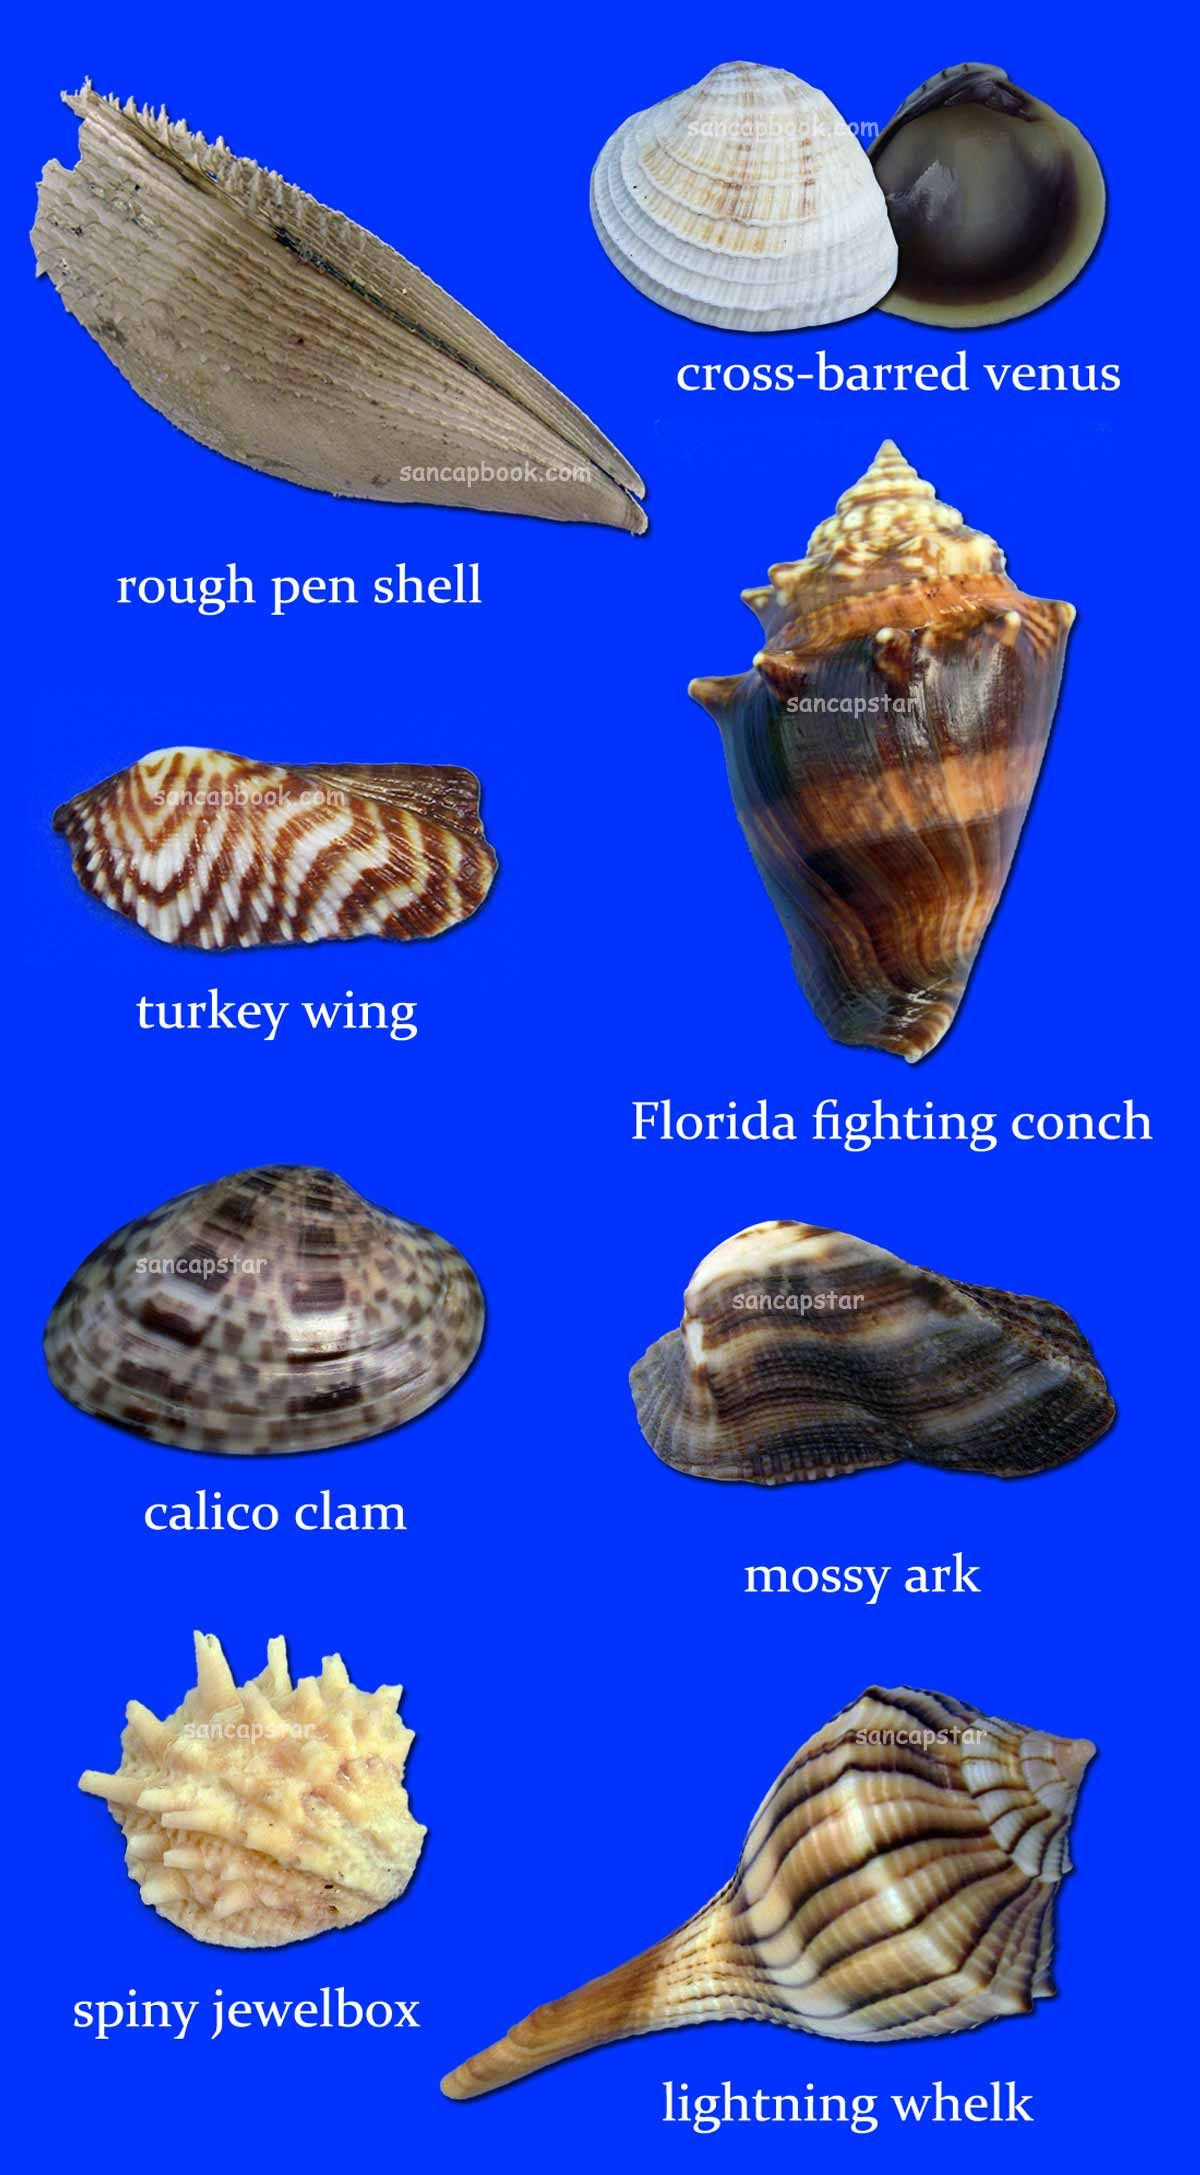 Sancapstar Shell Guide Shells, Sea shells